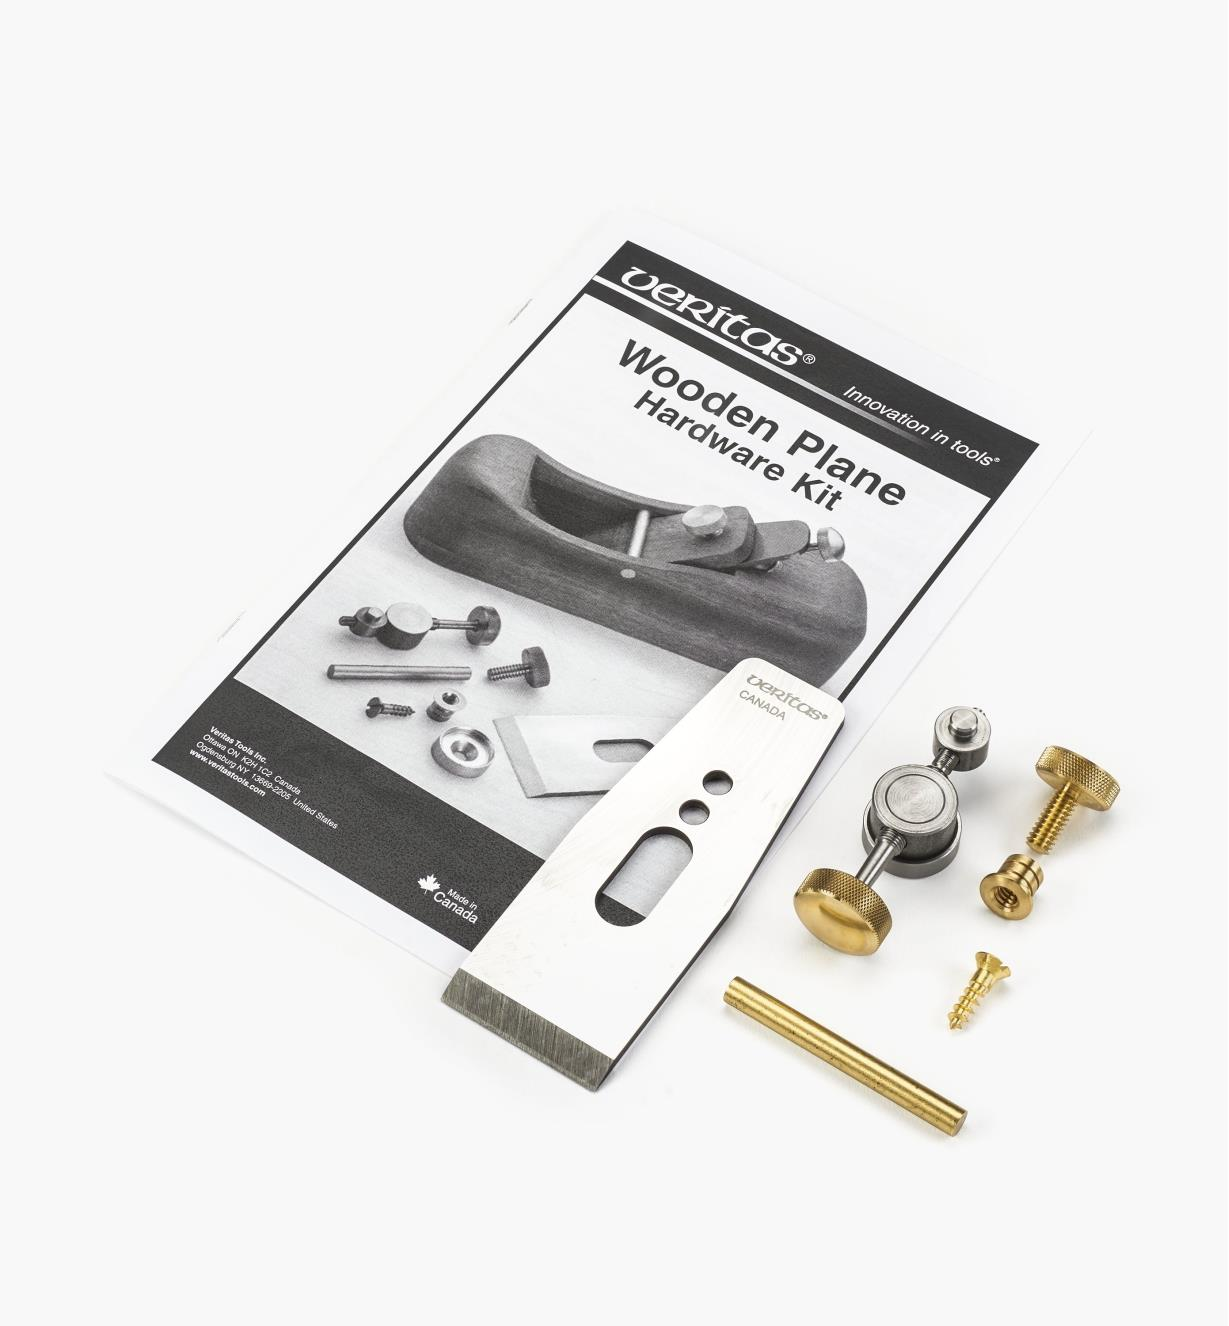 05P4042 - Veritas Wooden Plane Hardware Kit with O1 Blade